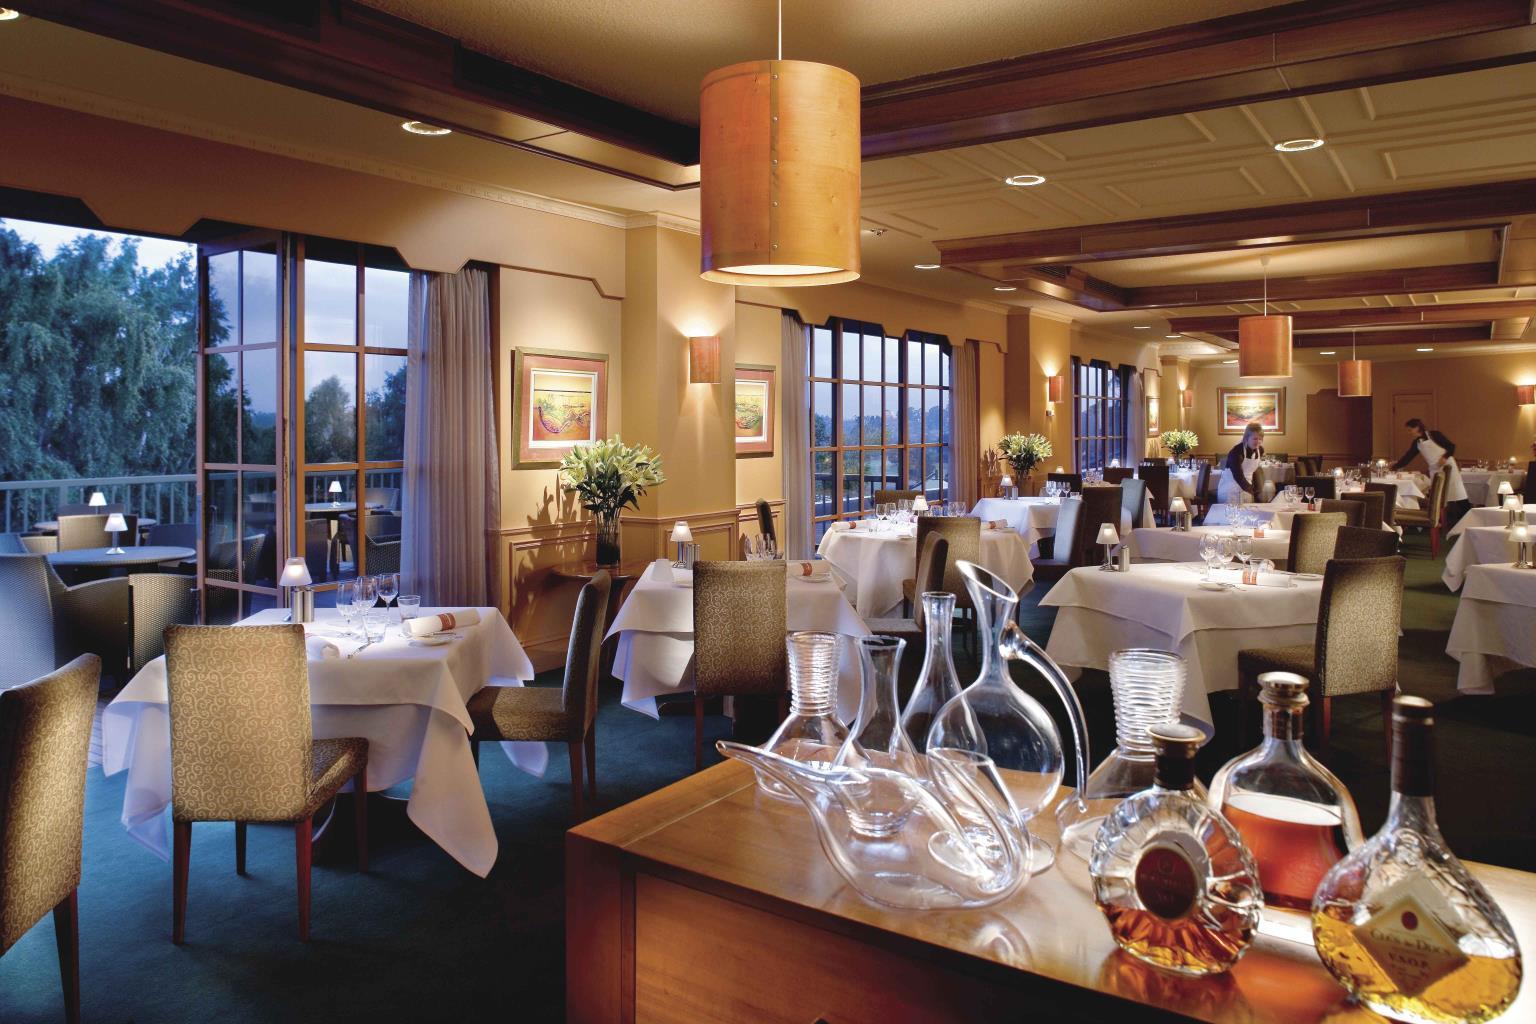 The terrace restaurant launceston casino genting casino manchester review